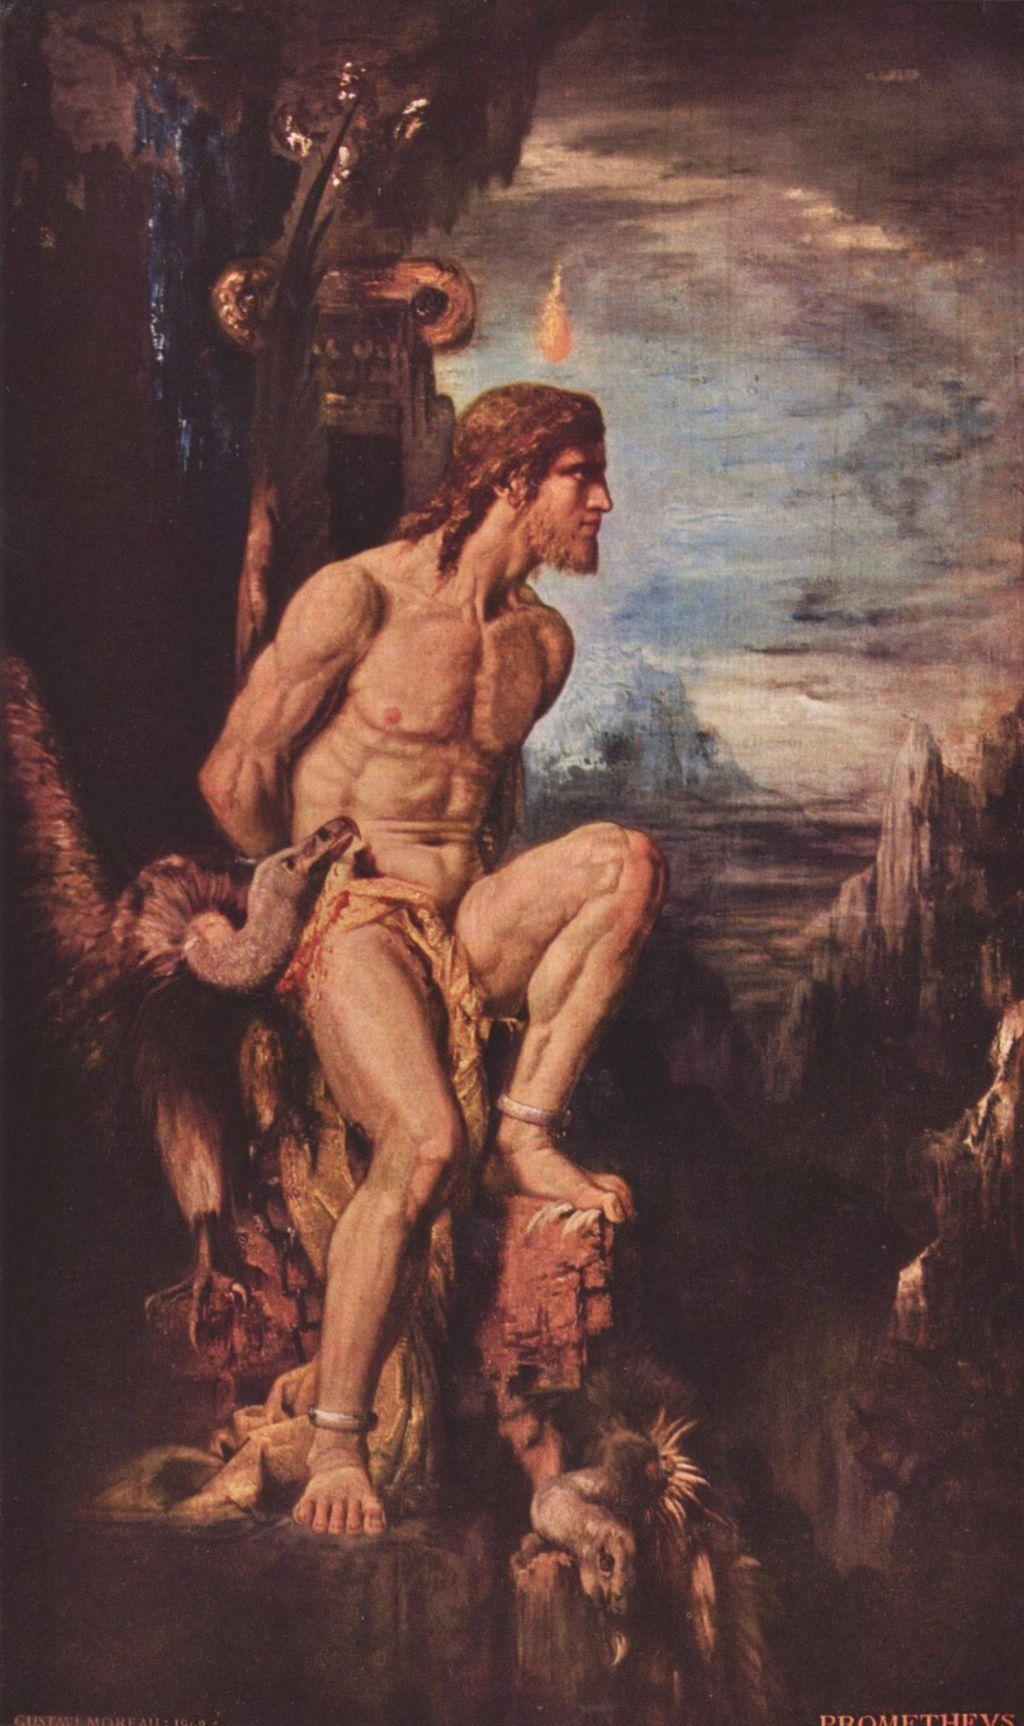 the tragedy of medea and jason from greek mythology